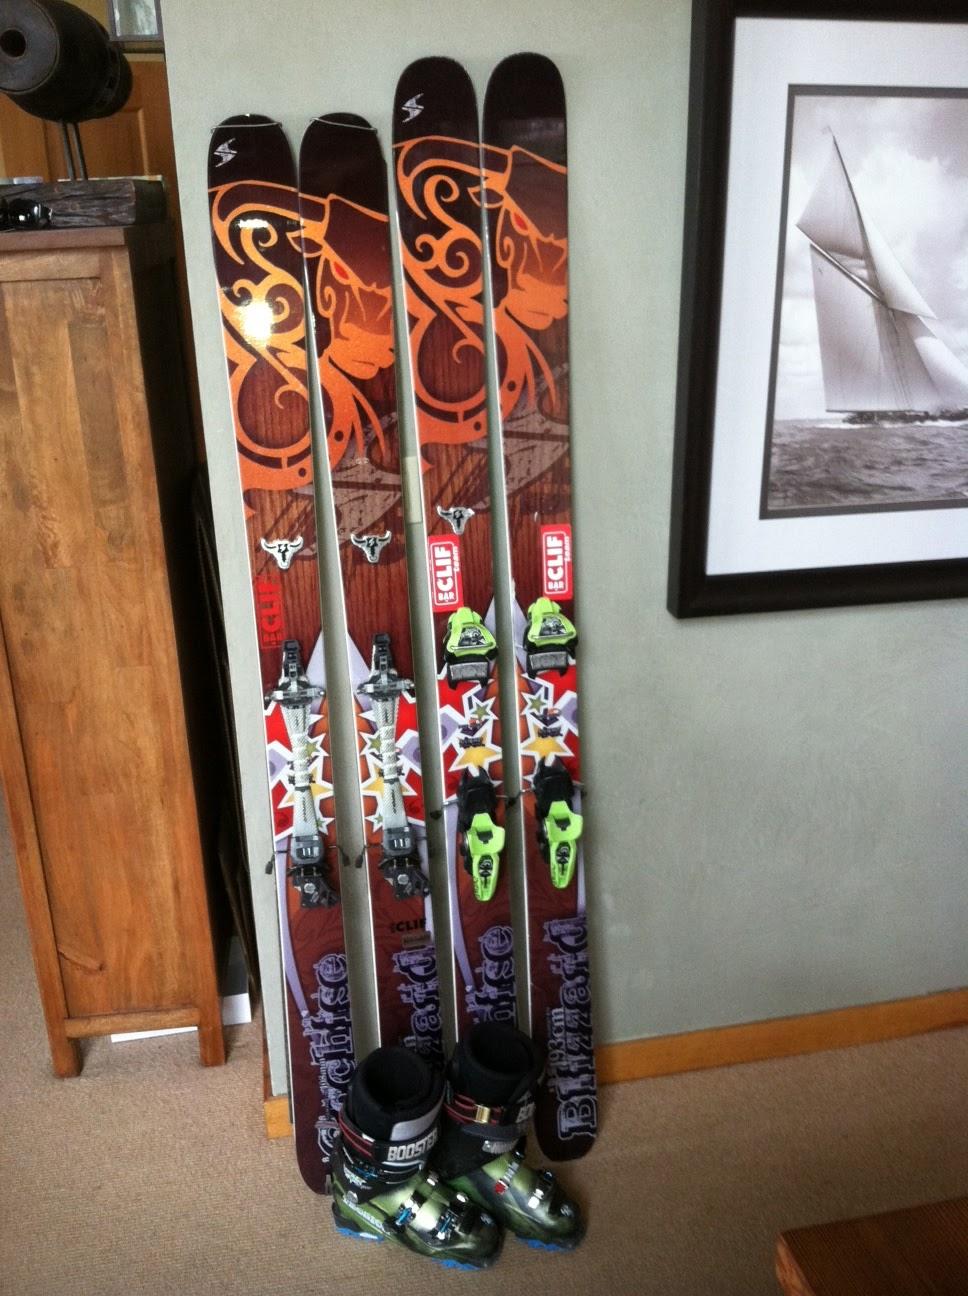 sierra ski journal tecnica cochise light cochise pro 130. Black Bedroom Furniture Sets. Home Design Ideas